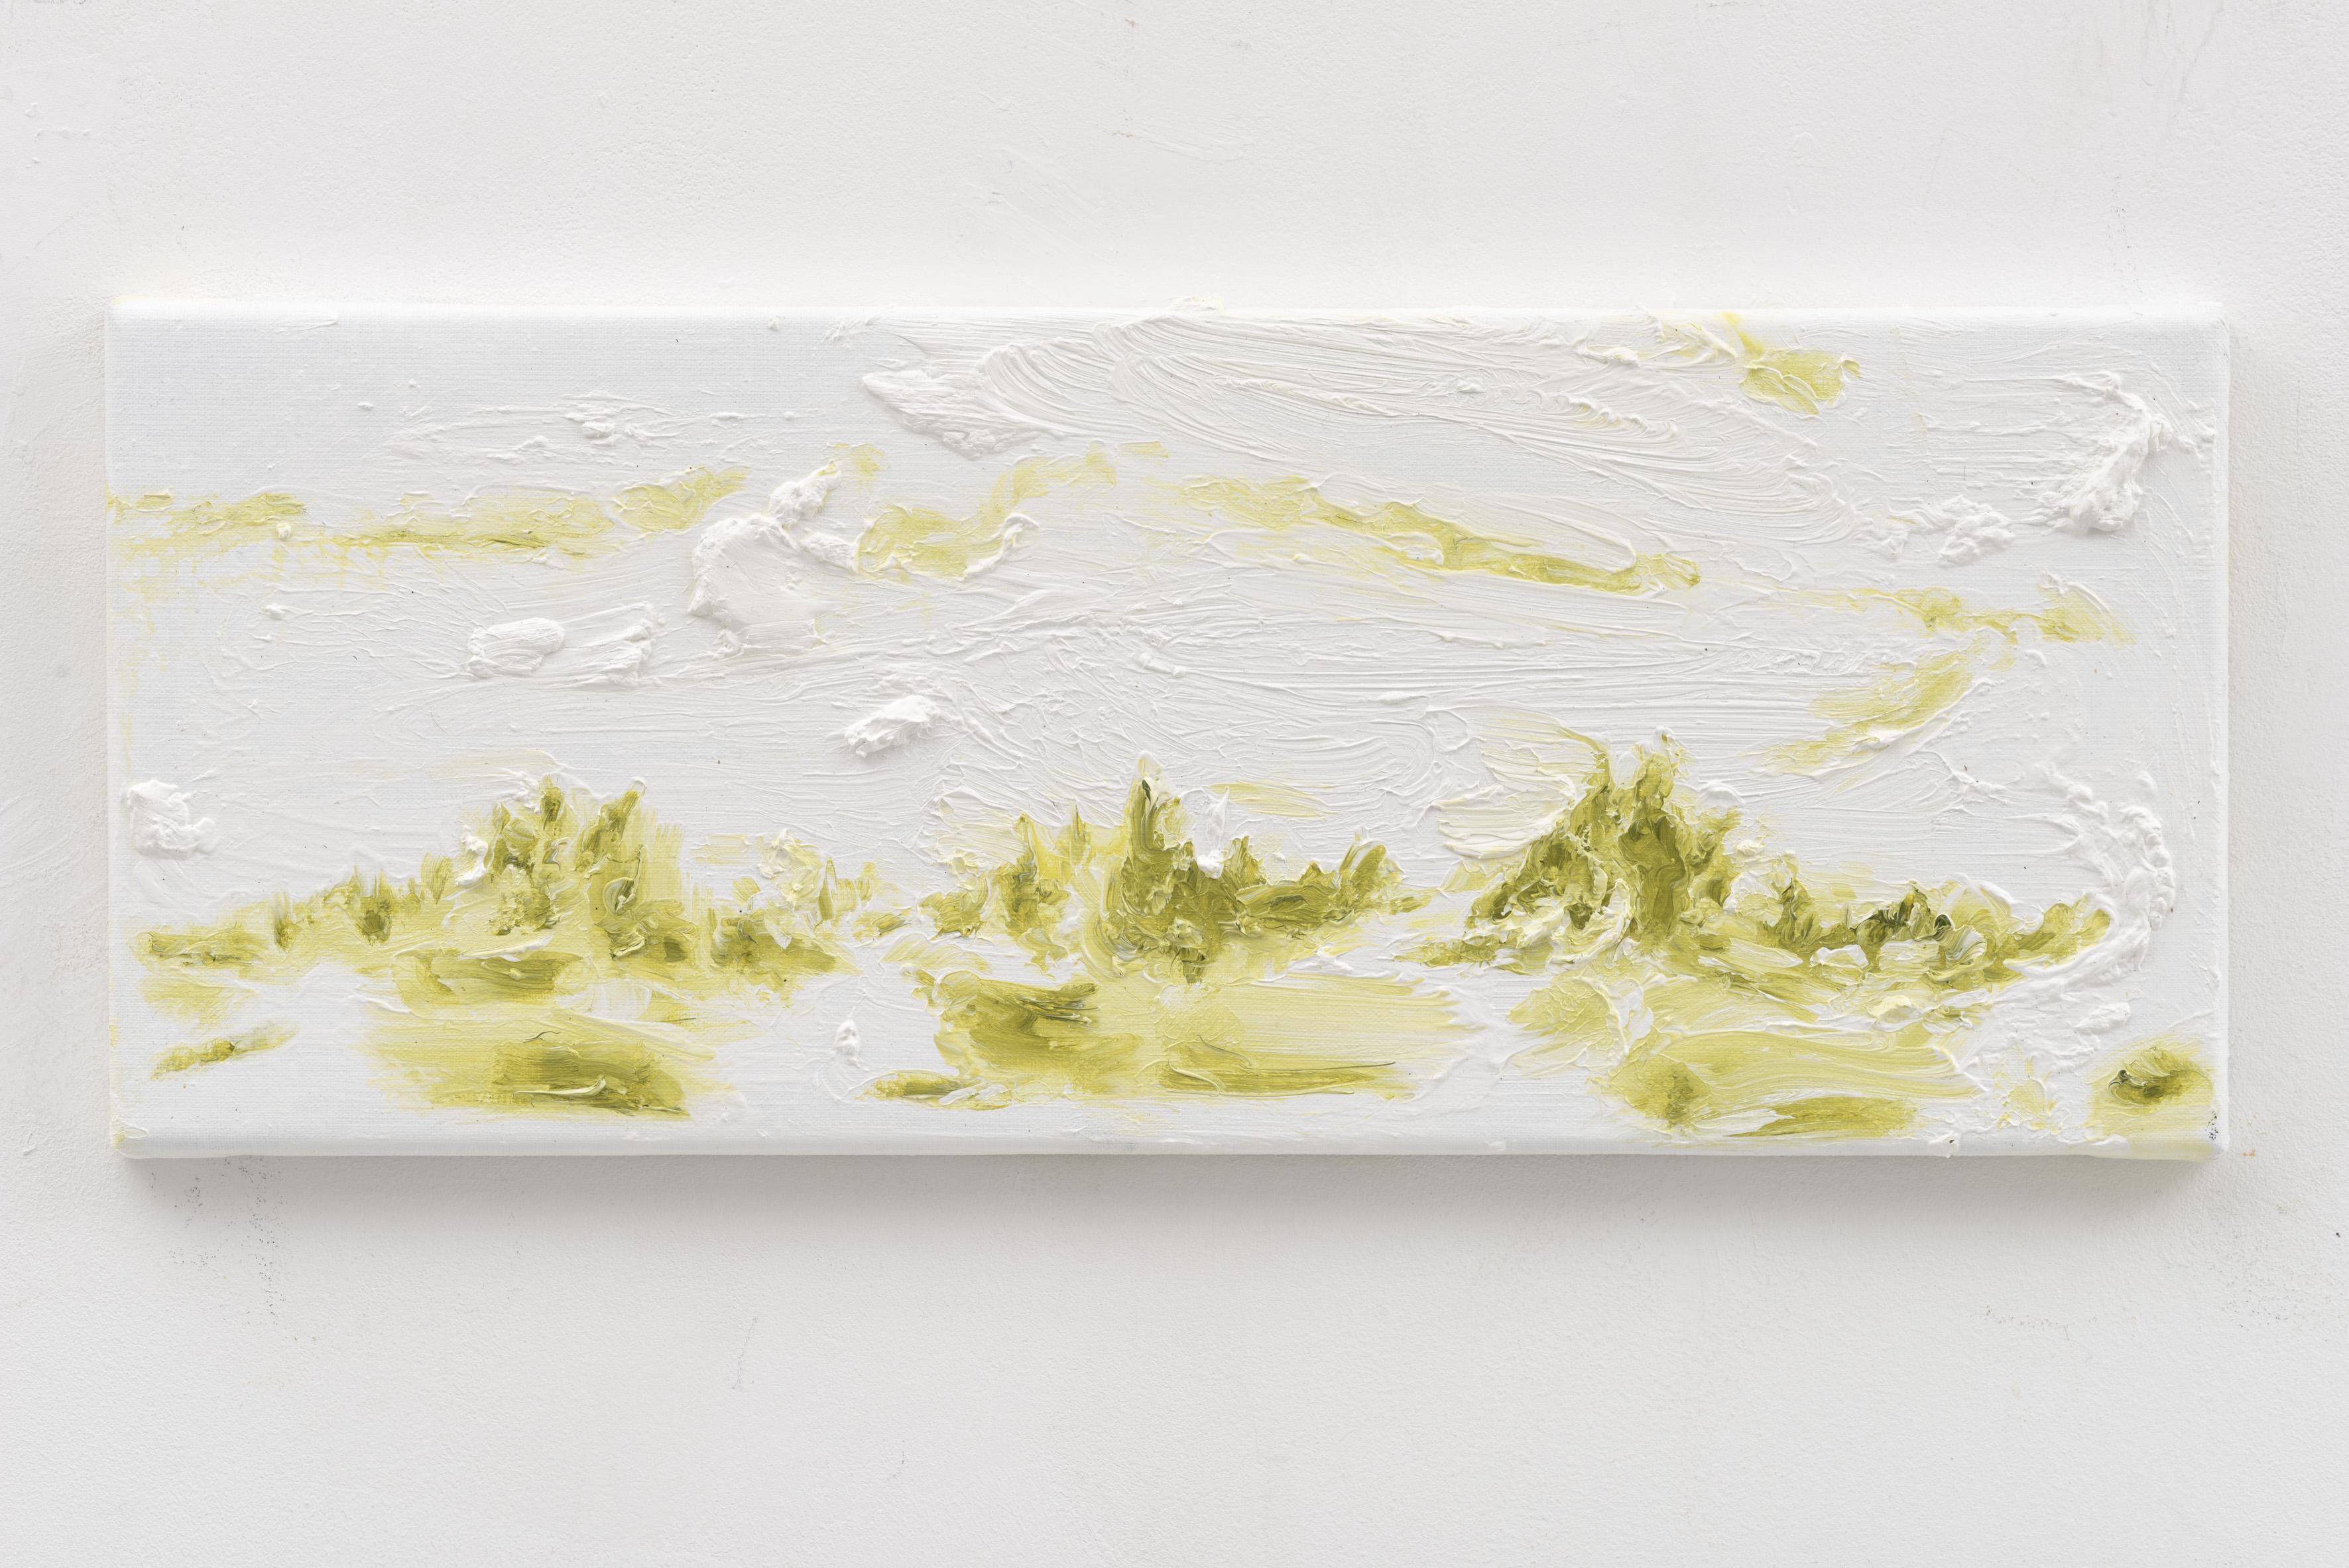 """Resonating Landscapes VIII"" 20 x 50 cm. oil on linen 2017"